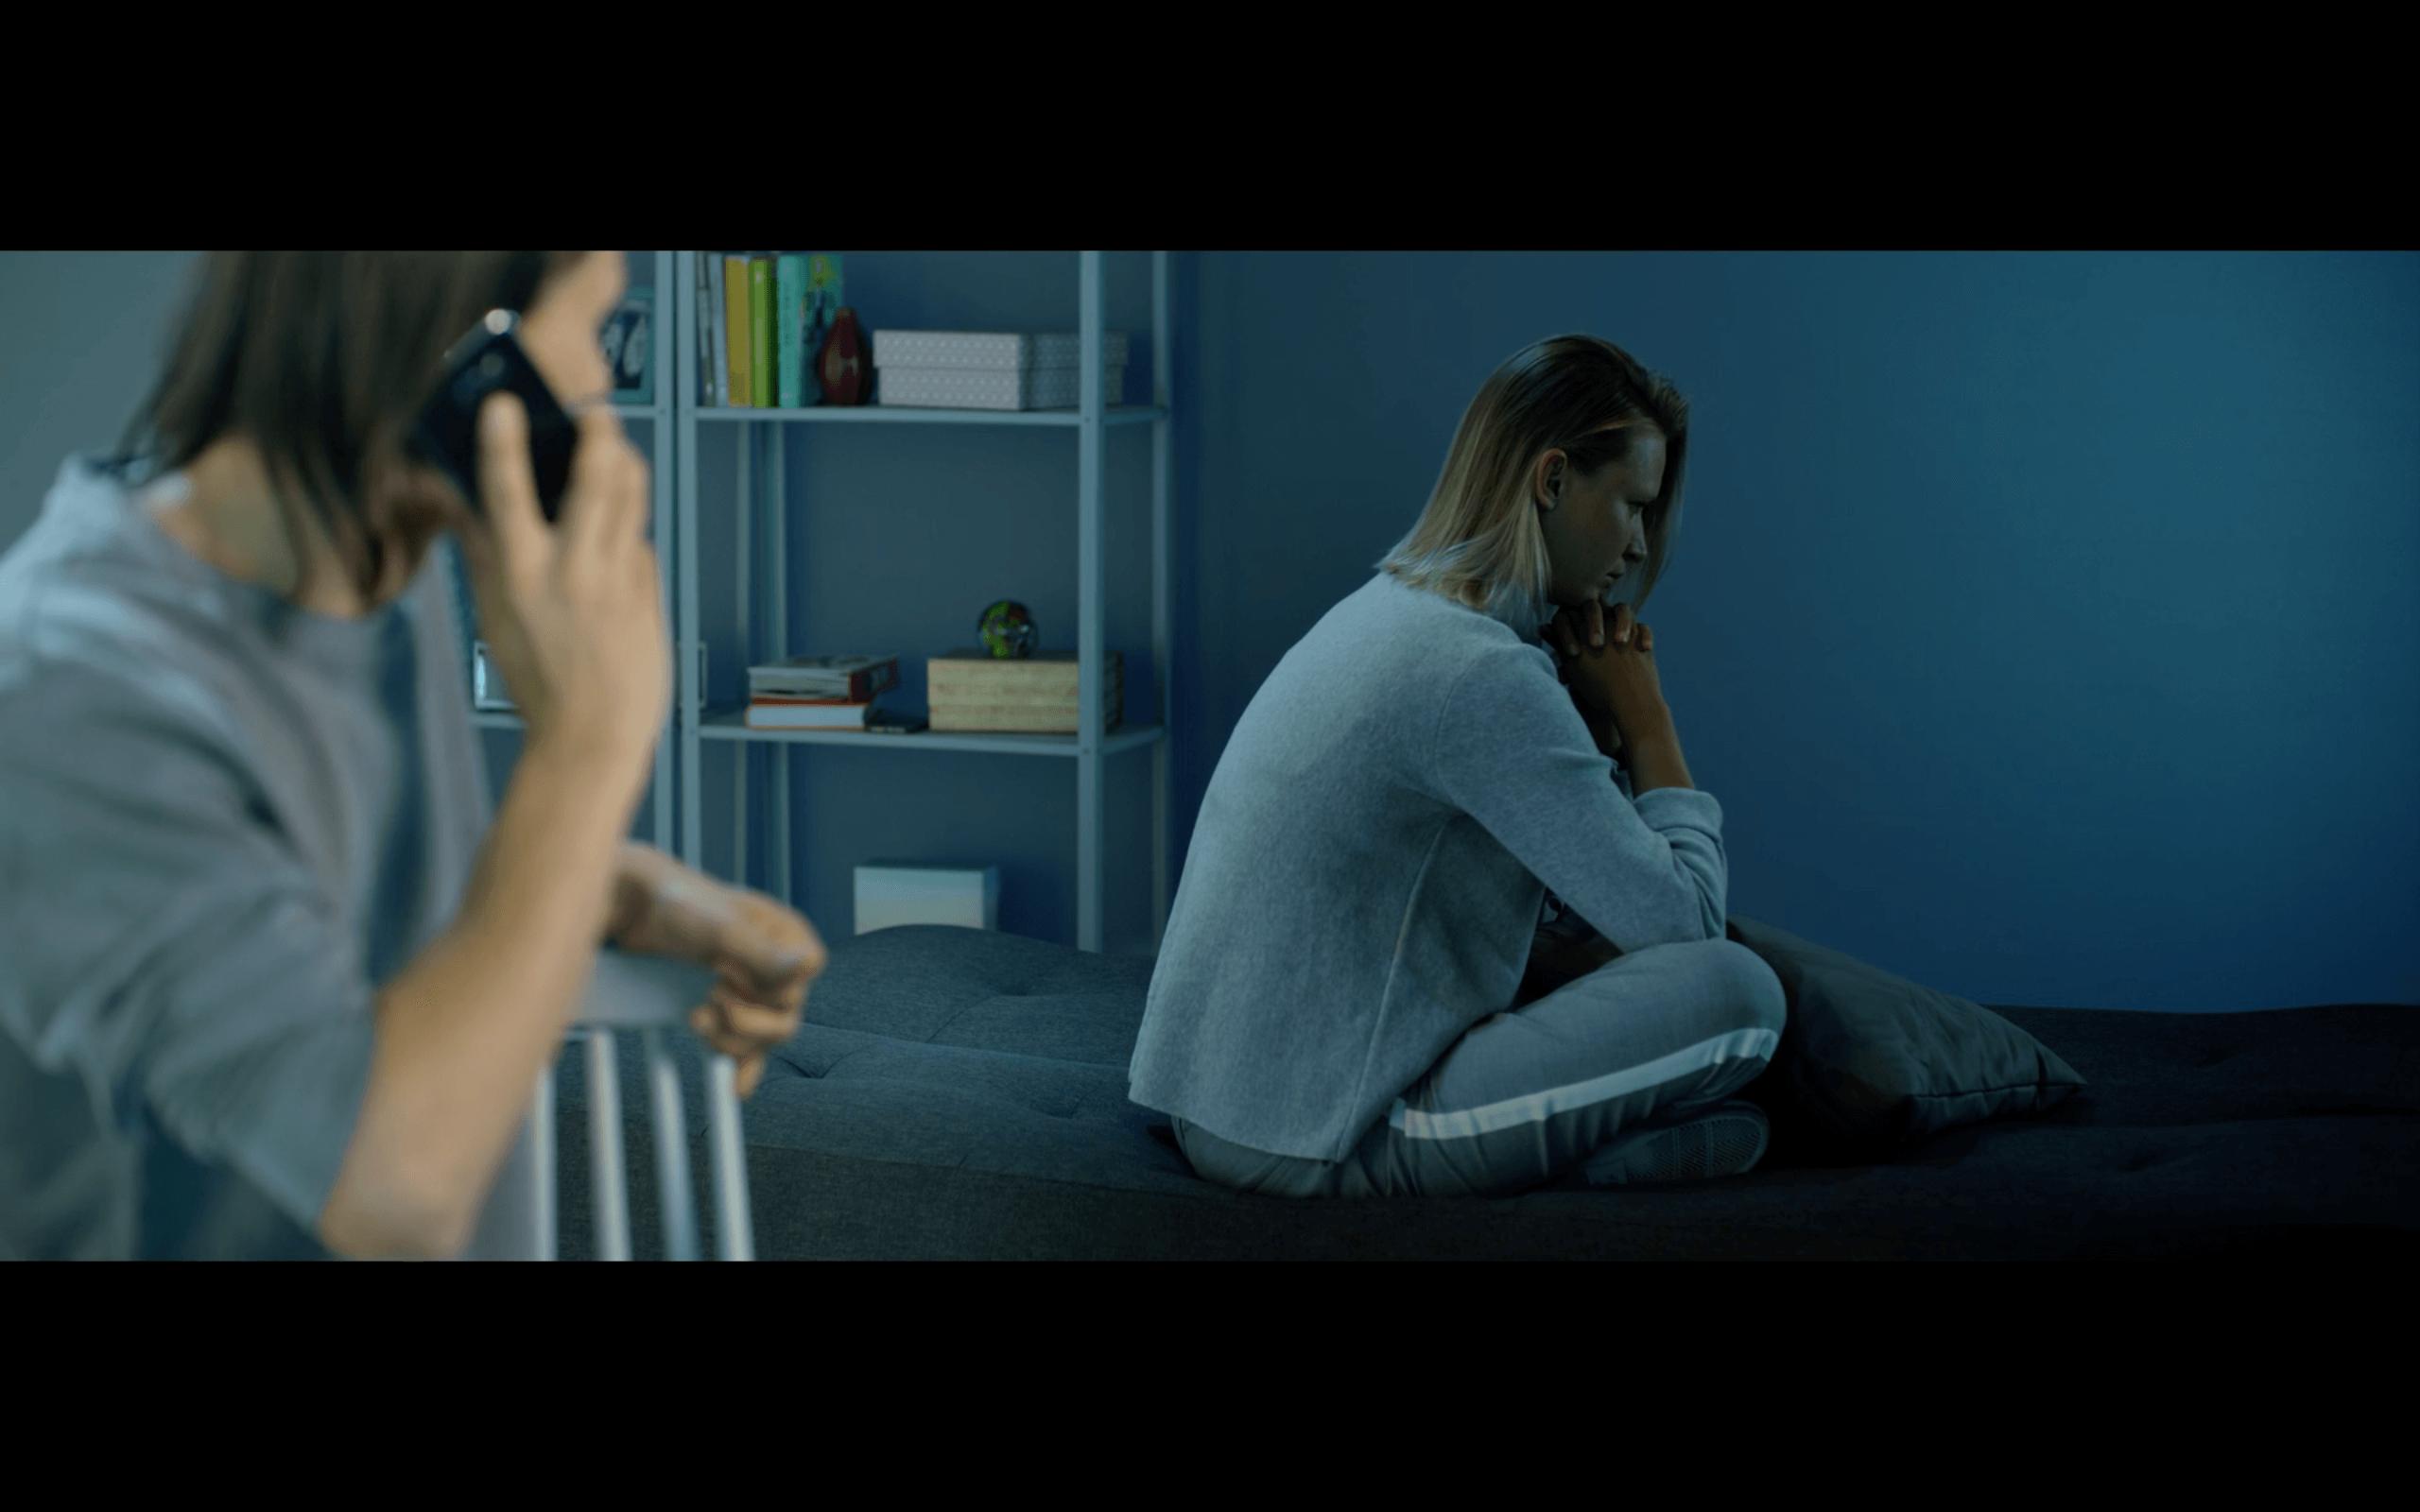 Campaign on Depression